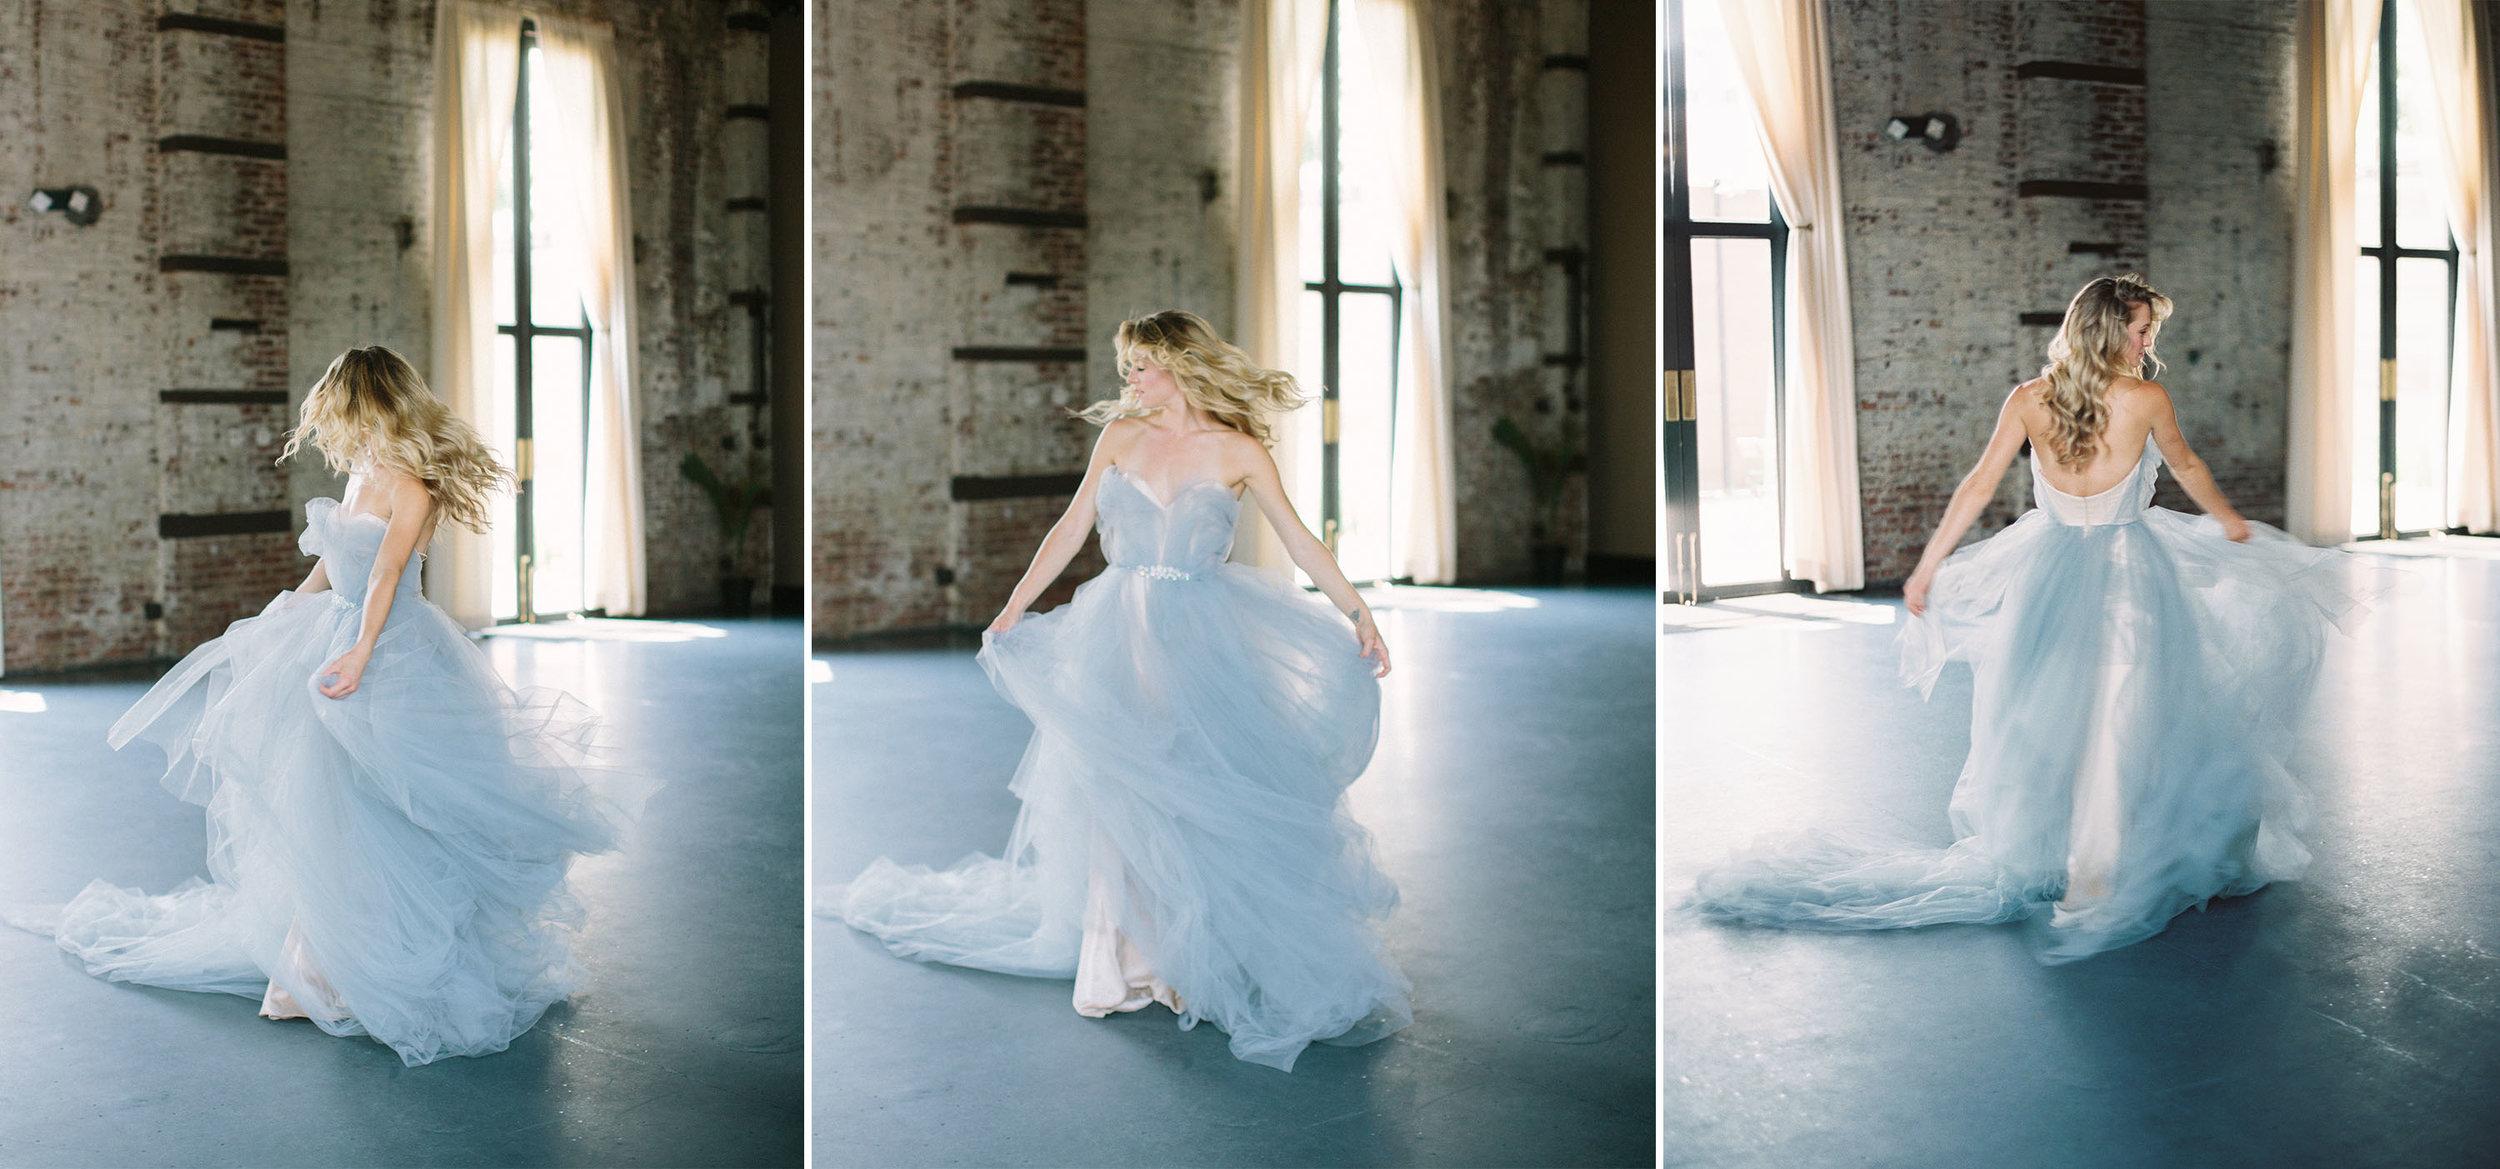 Carol Hannah Bridal Oceane Gown Pyrite Gown Multi 1.jpg